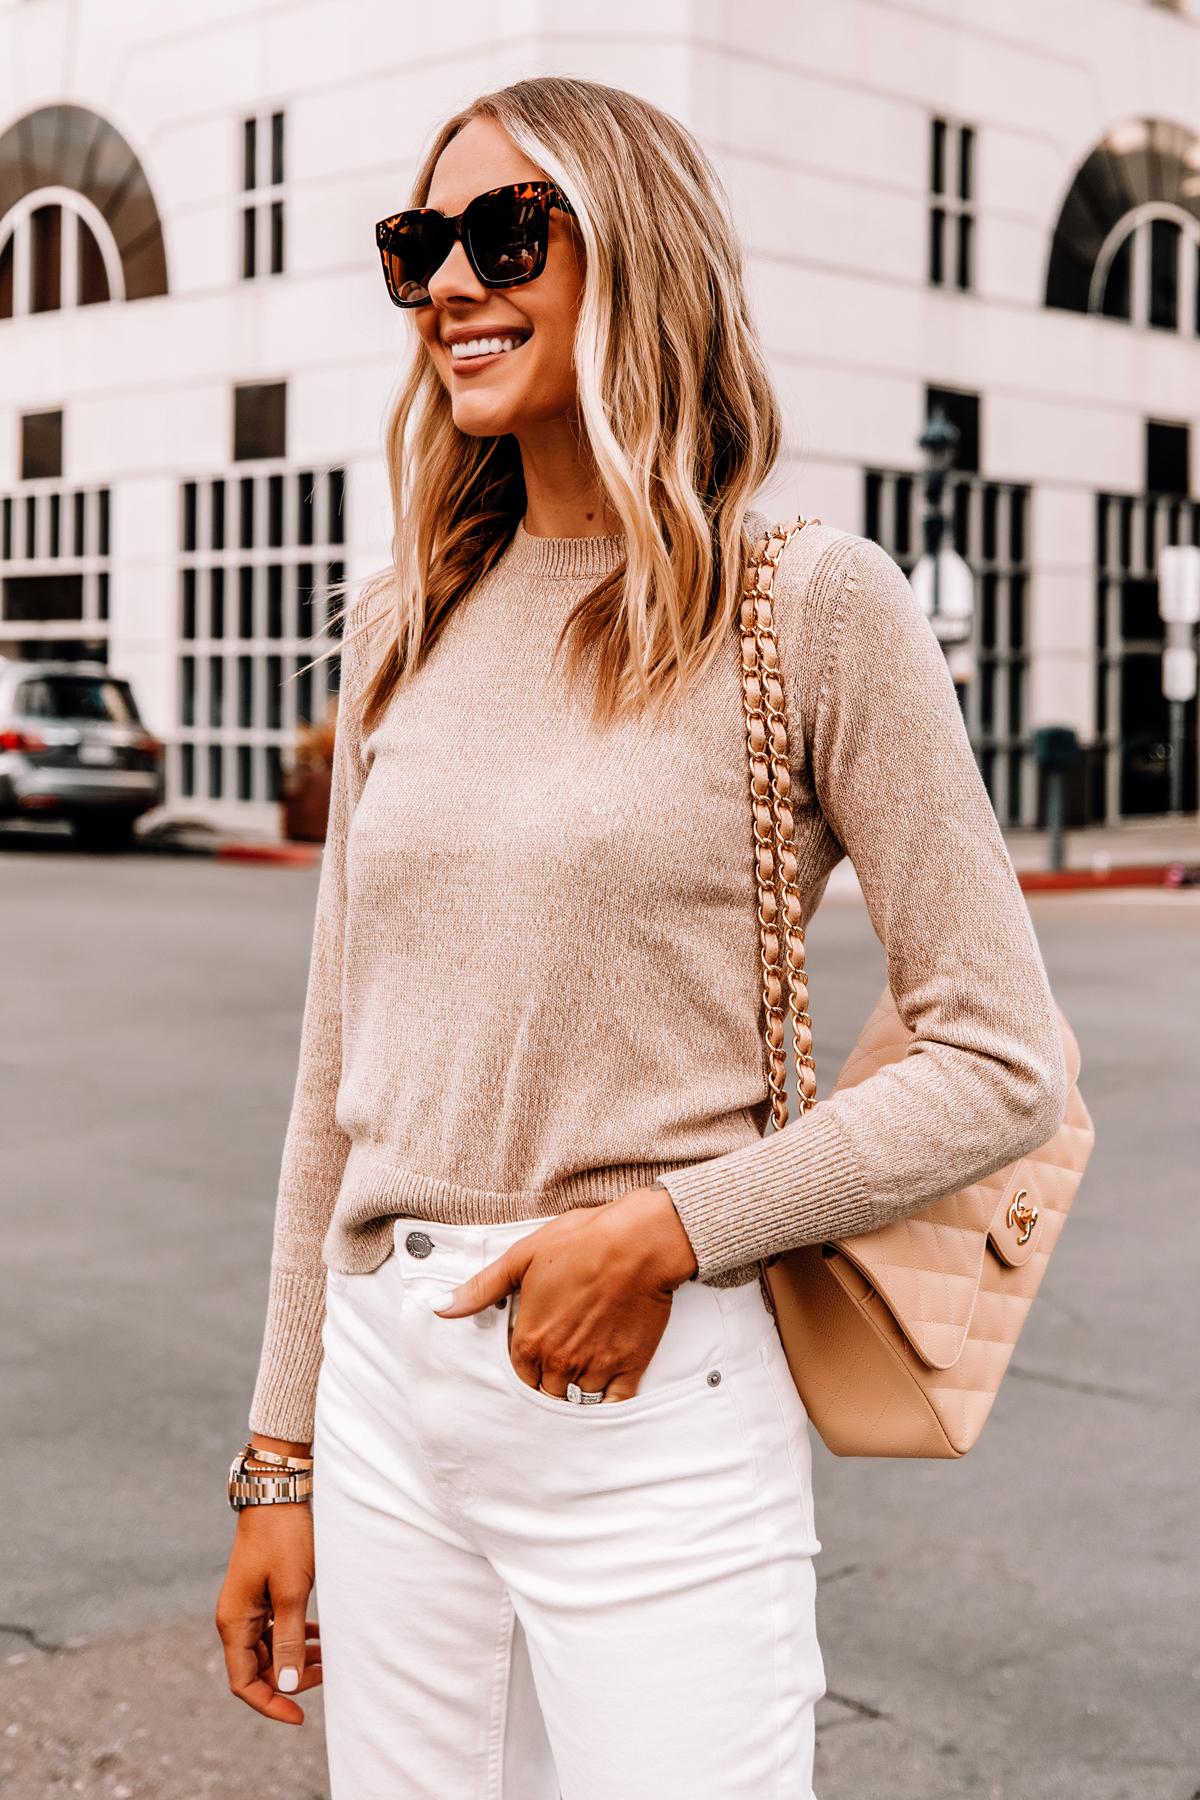 Fashion Jackson Wearing Everlane Beige Sweater White Jeans Beige Chanel Handbag 1